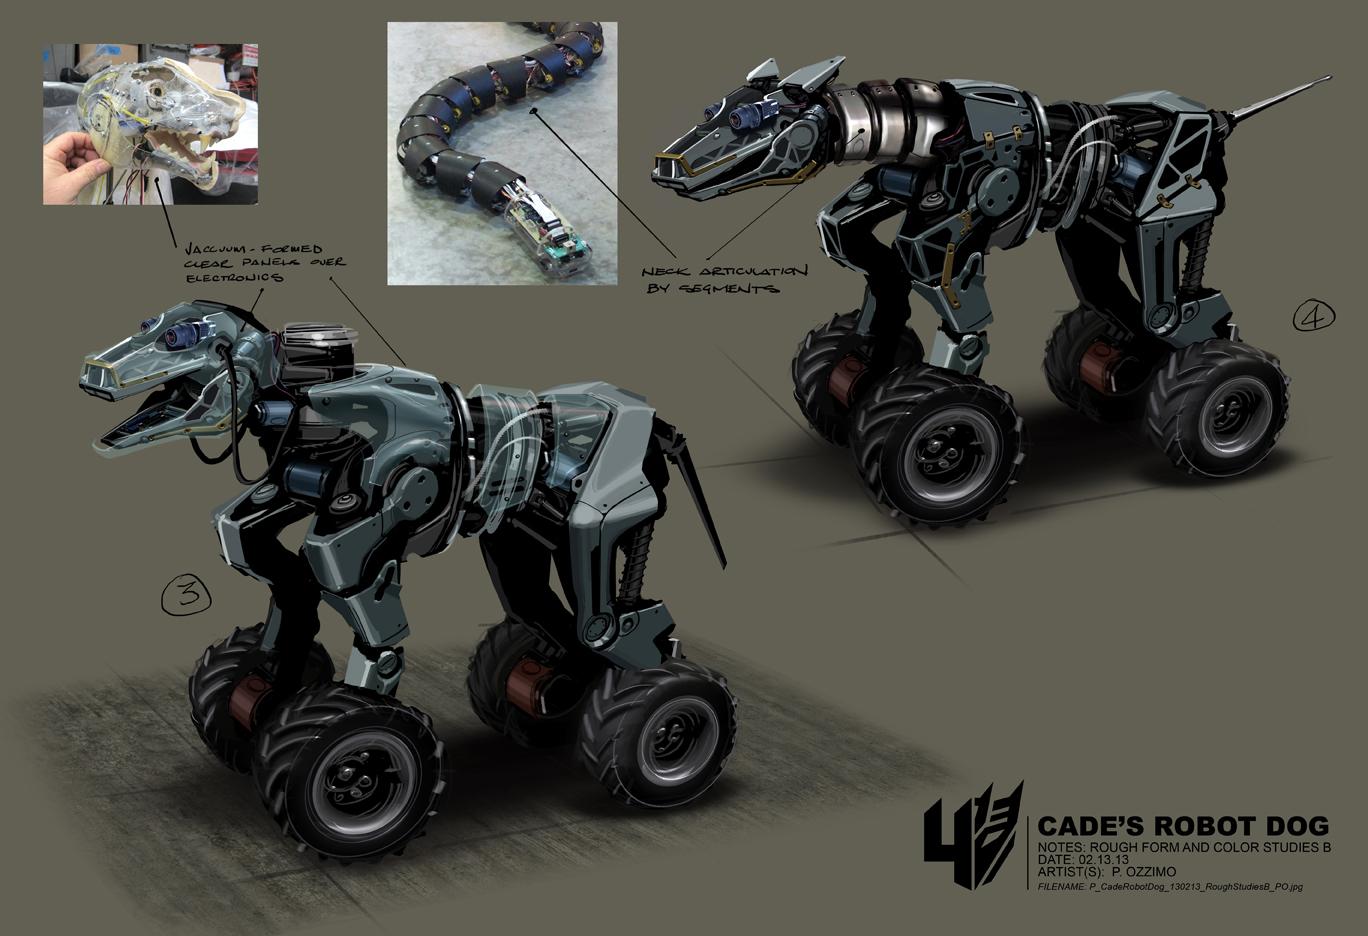 P_CadeRobotDog_130213_RoughStudiesB_PO.jpg